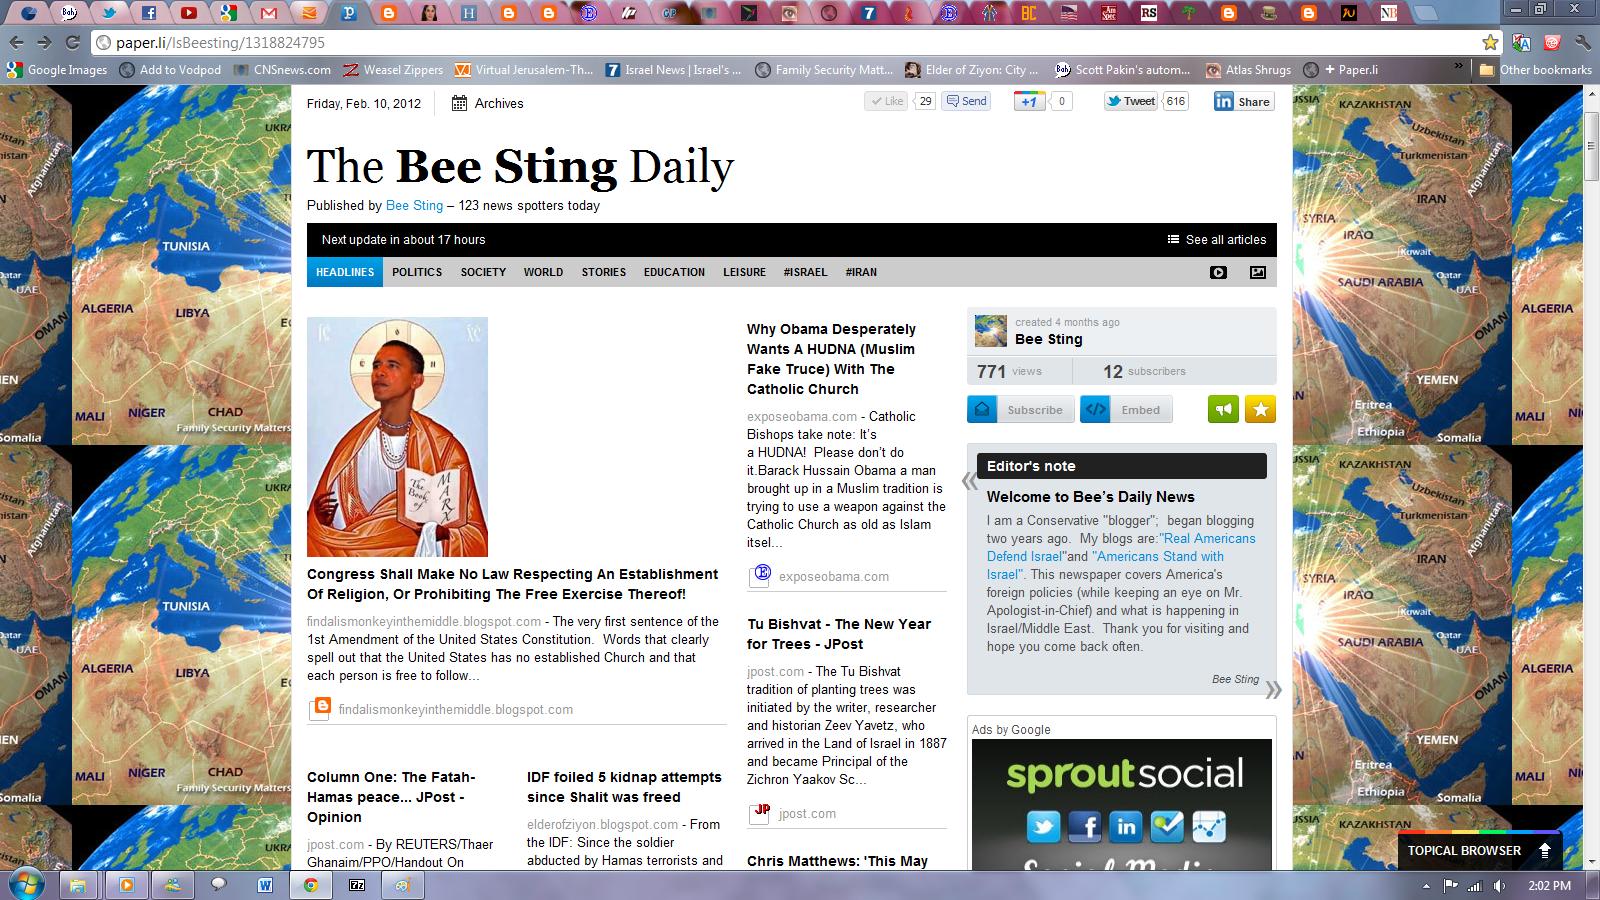 http://1.bp.blogspot.com/-tg_baUw7u3k/TzVqEK3FCMI/AAAAAAAAD84/_XJOQS6IXi0/s1600/The+Bee+Sting+Daily+news.png